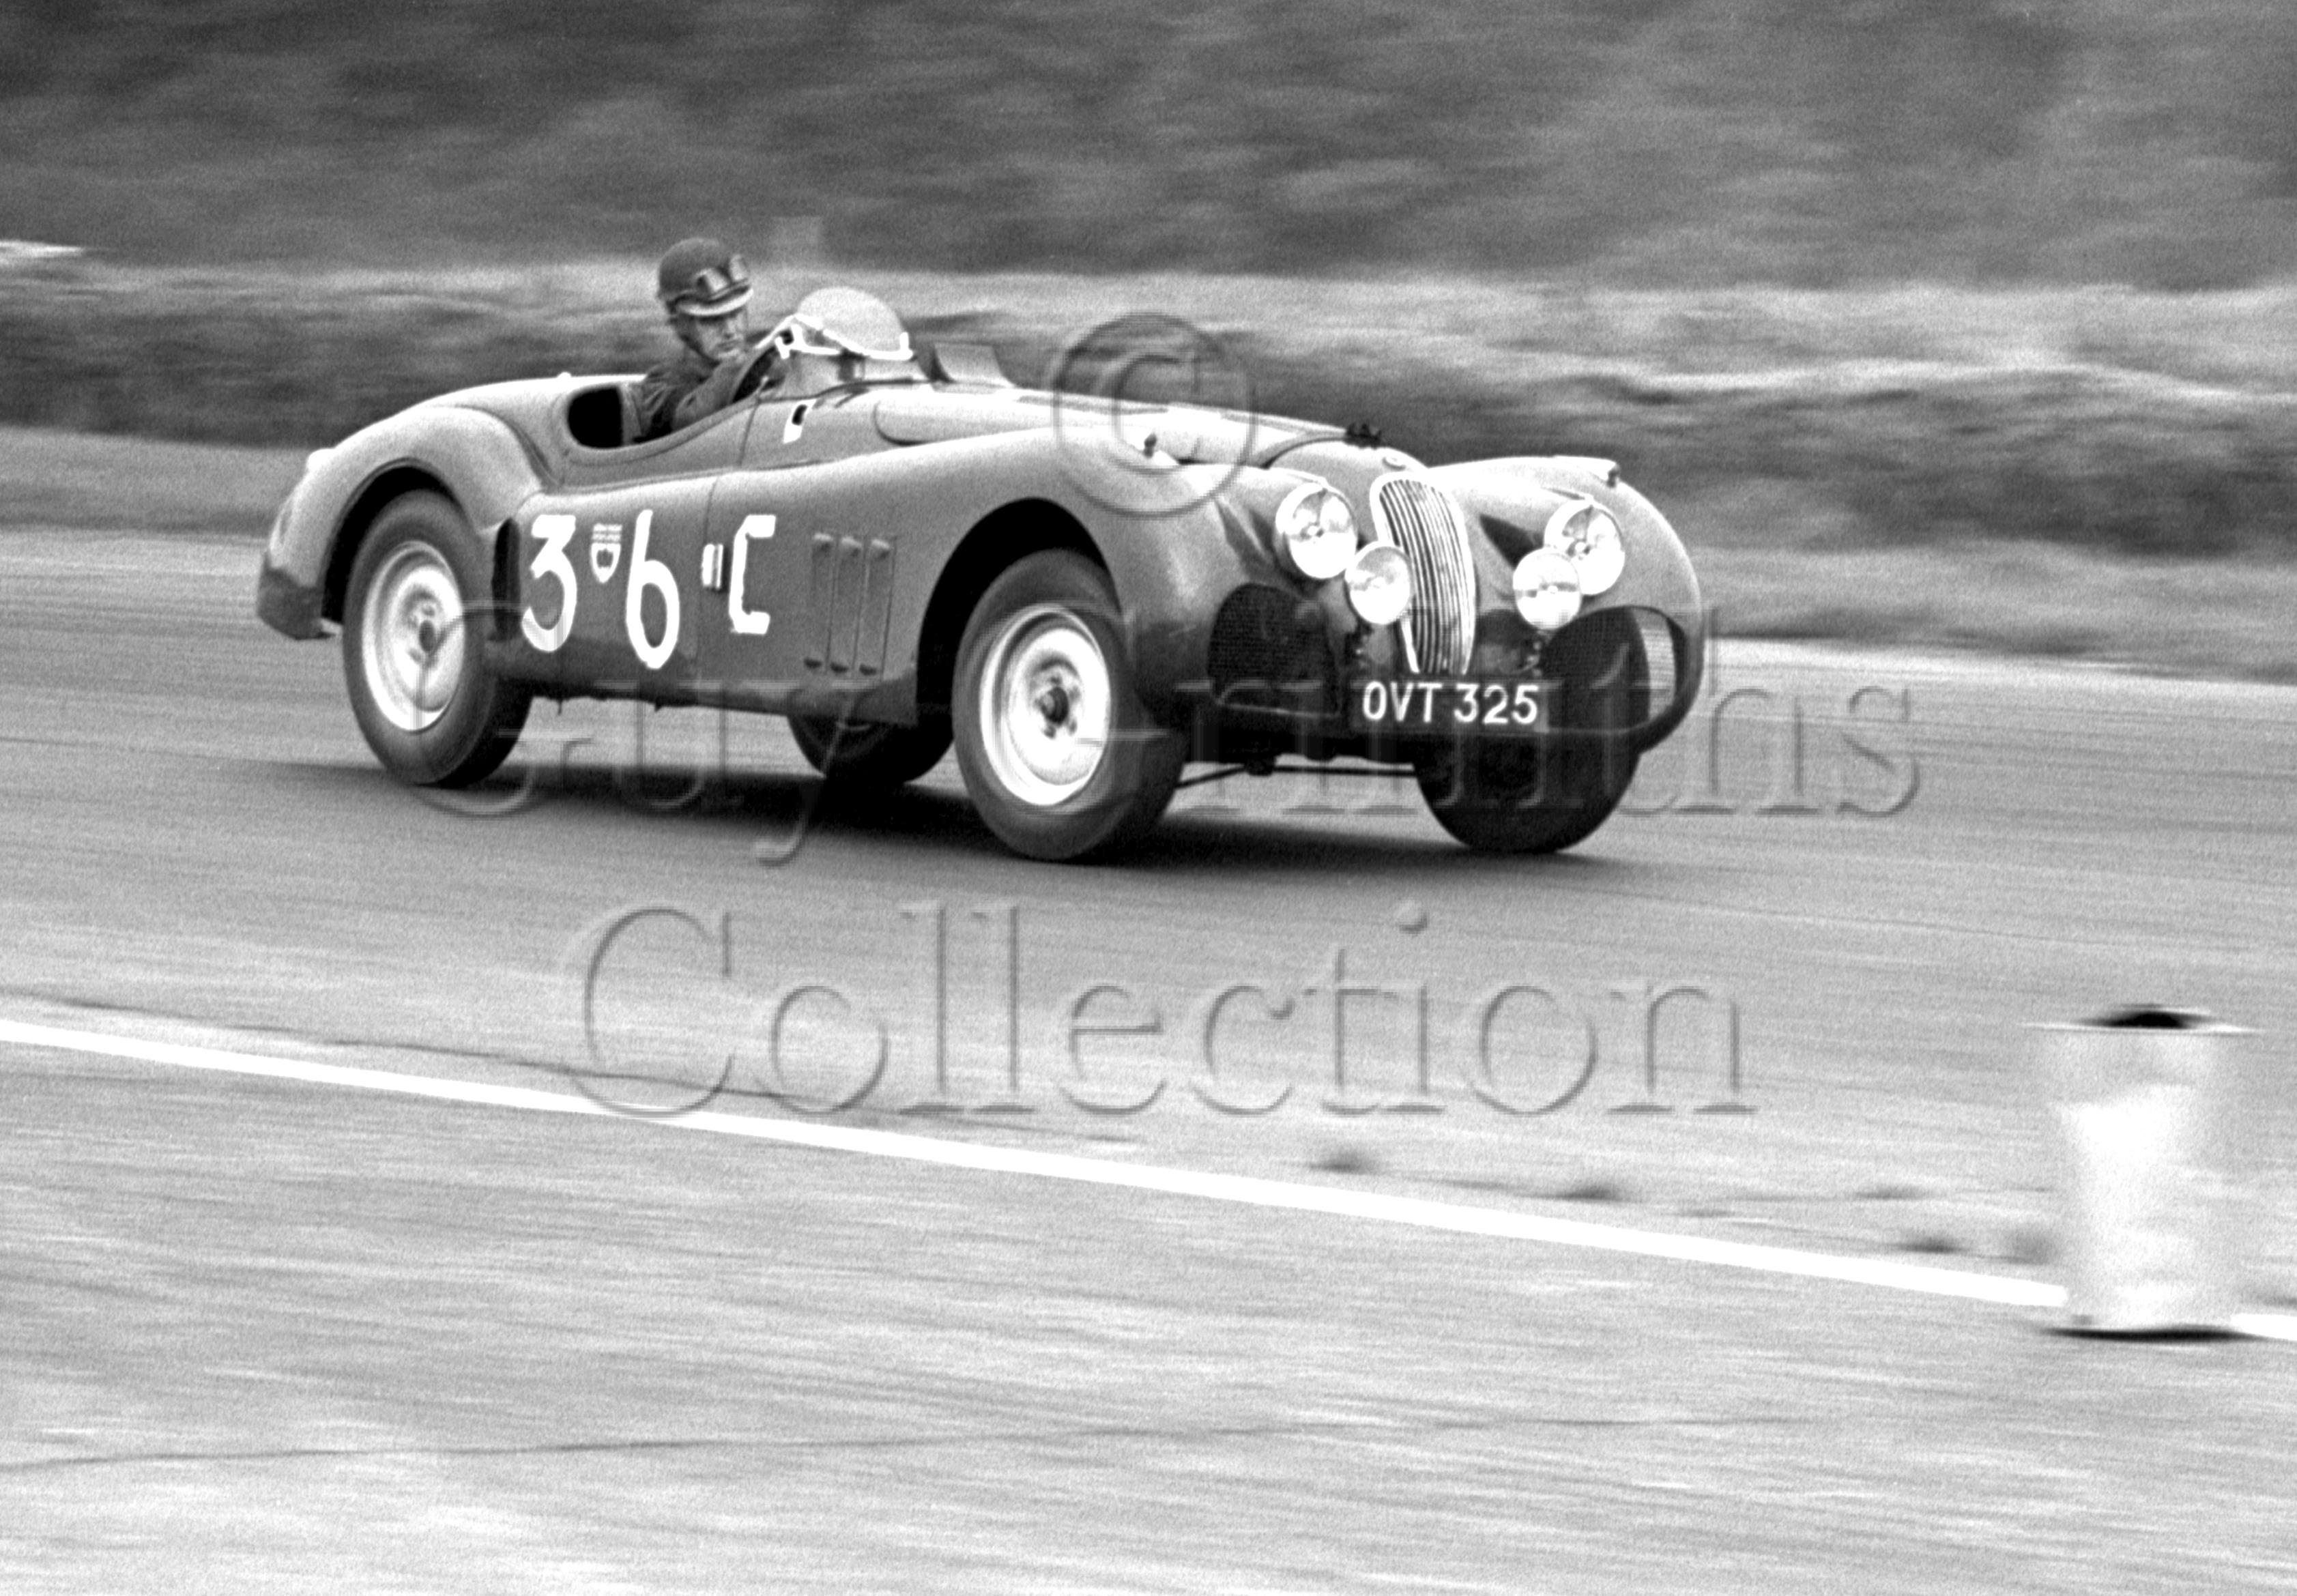 60-392–J-Swift–Jaguar-XK-120-OVT-325–Silverstone–30-08-1952.jpg - Guy Griffiths Collection